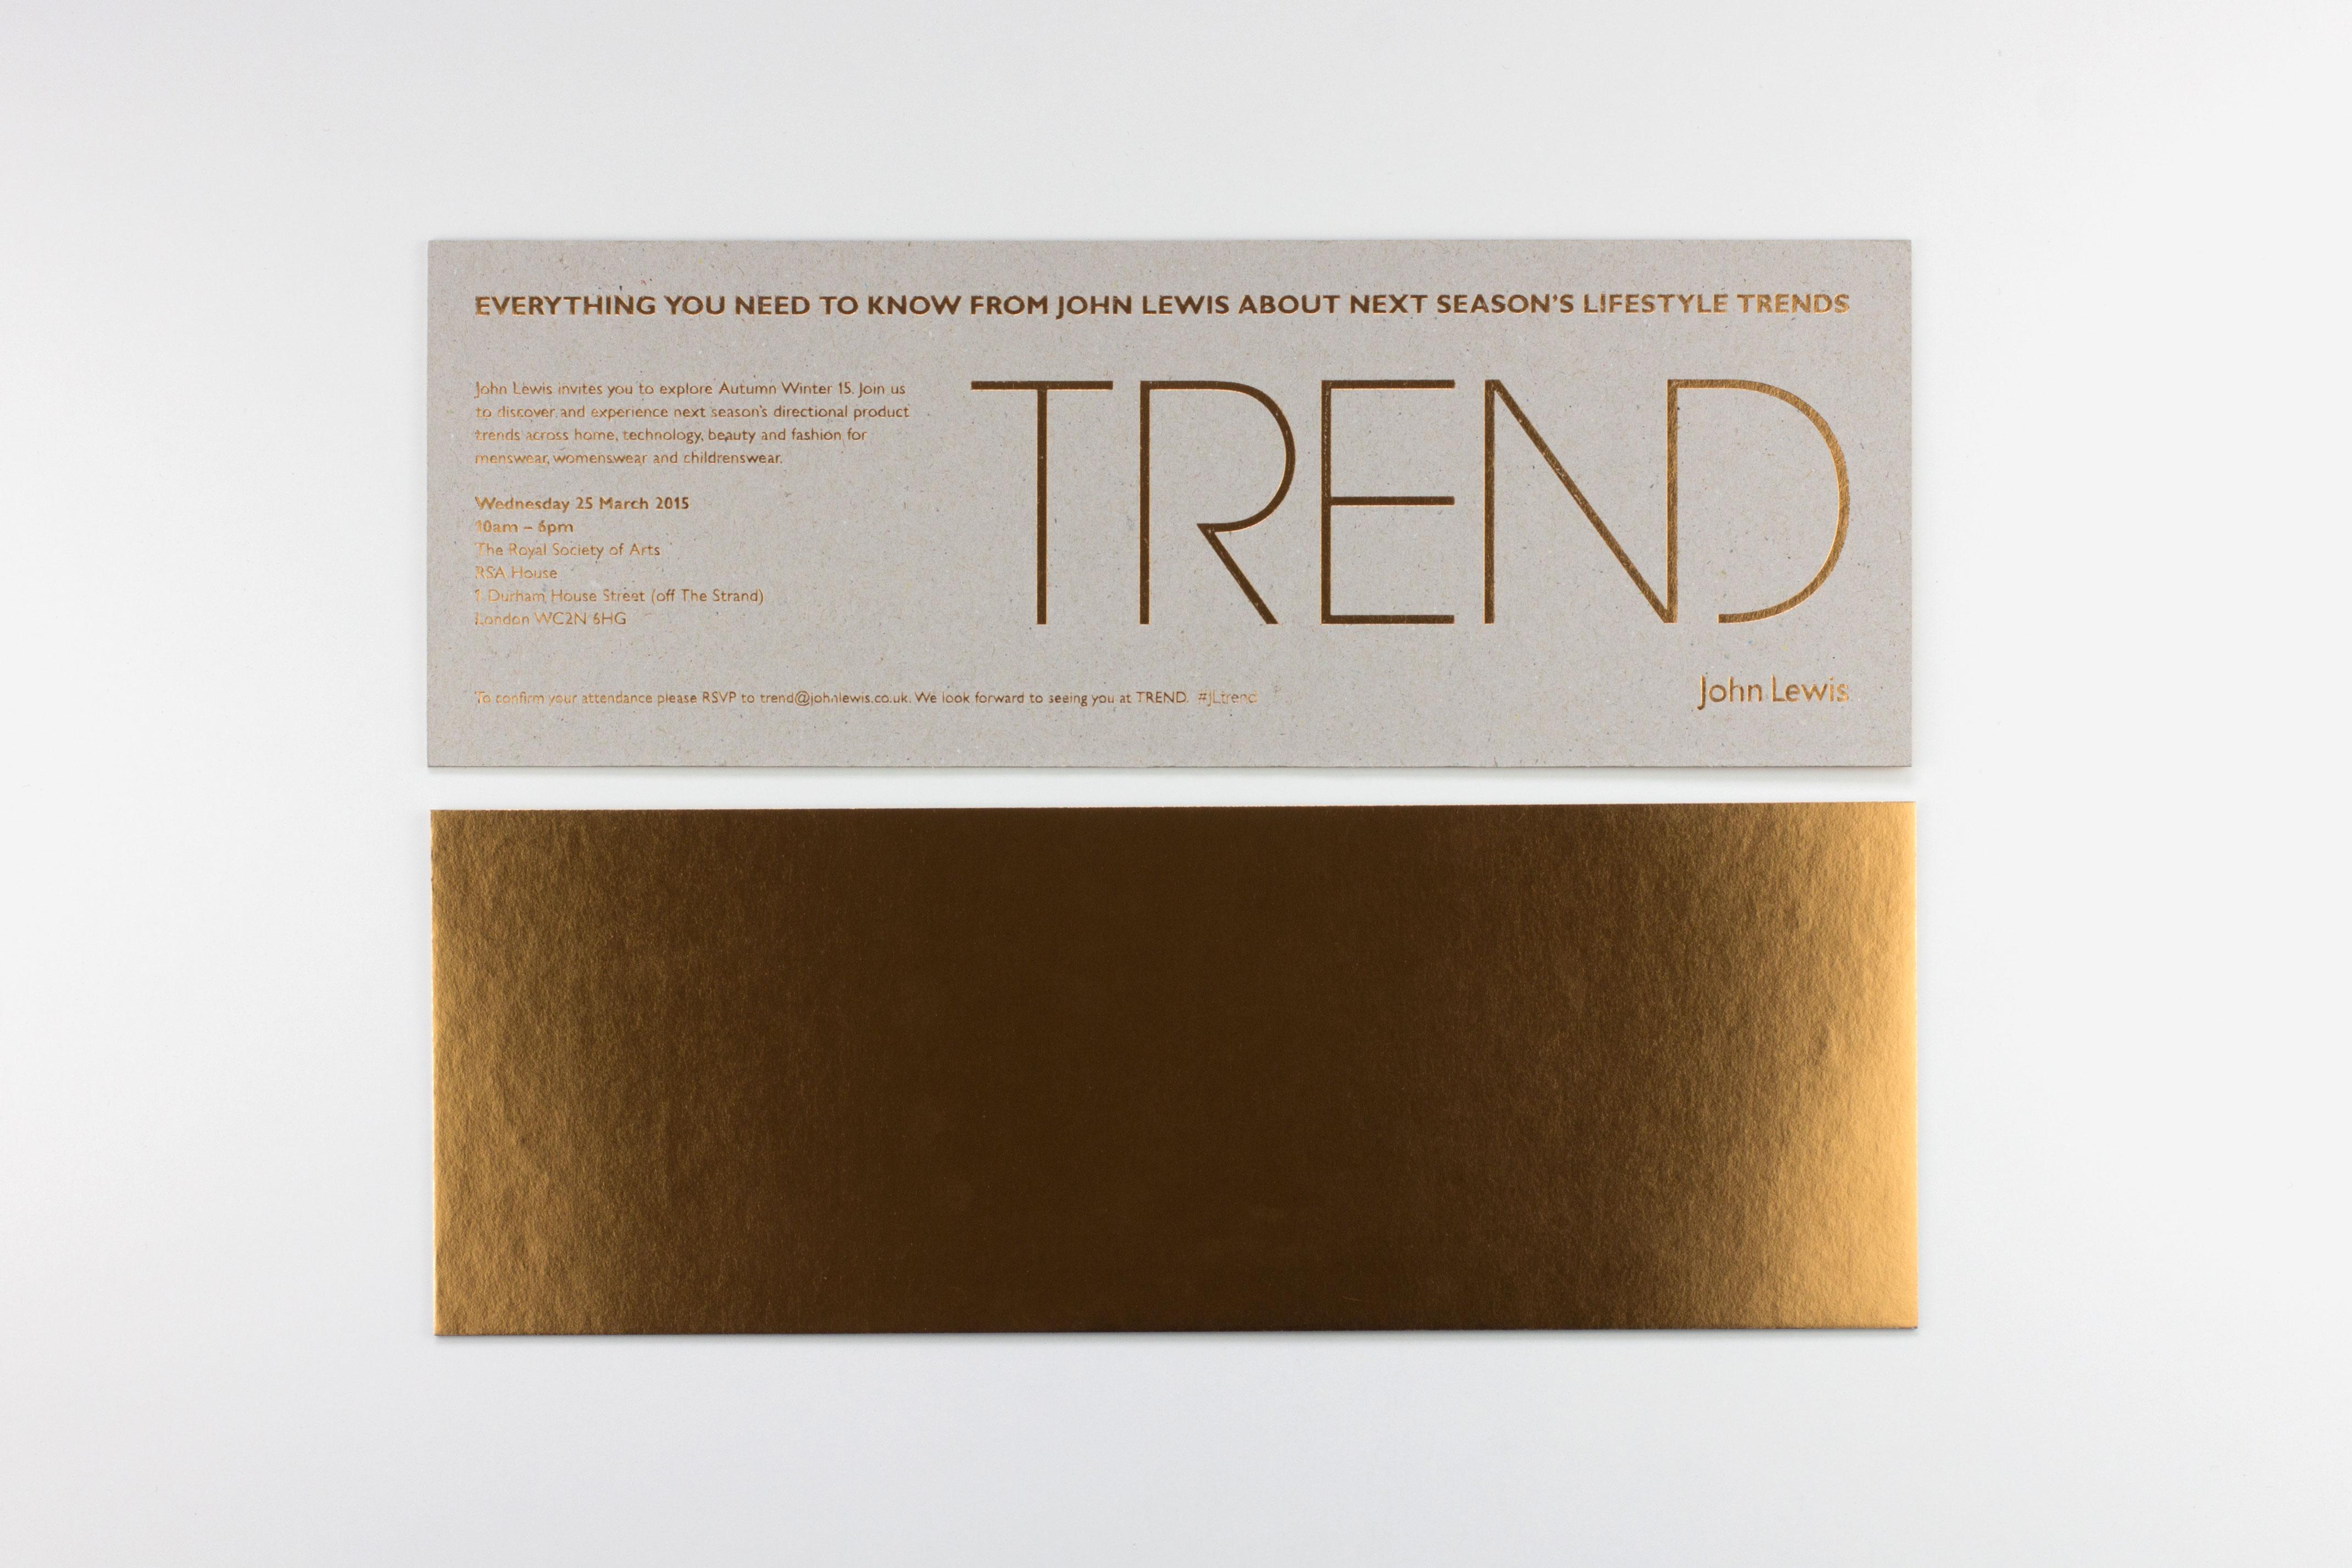 John-Lewis-Trend-2